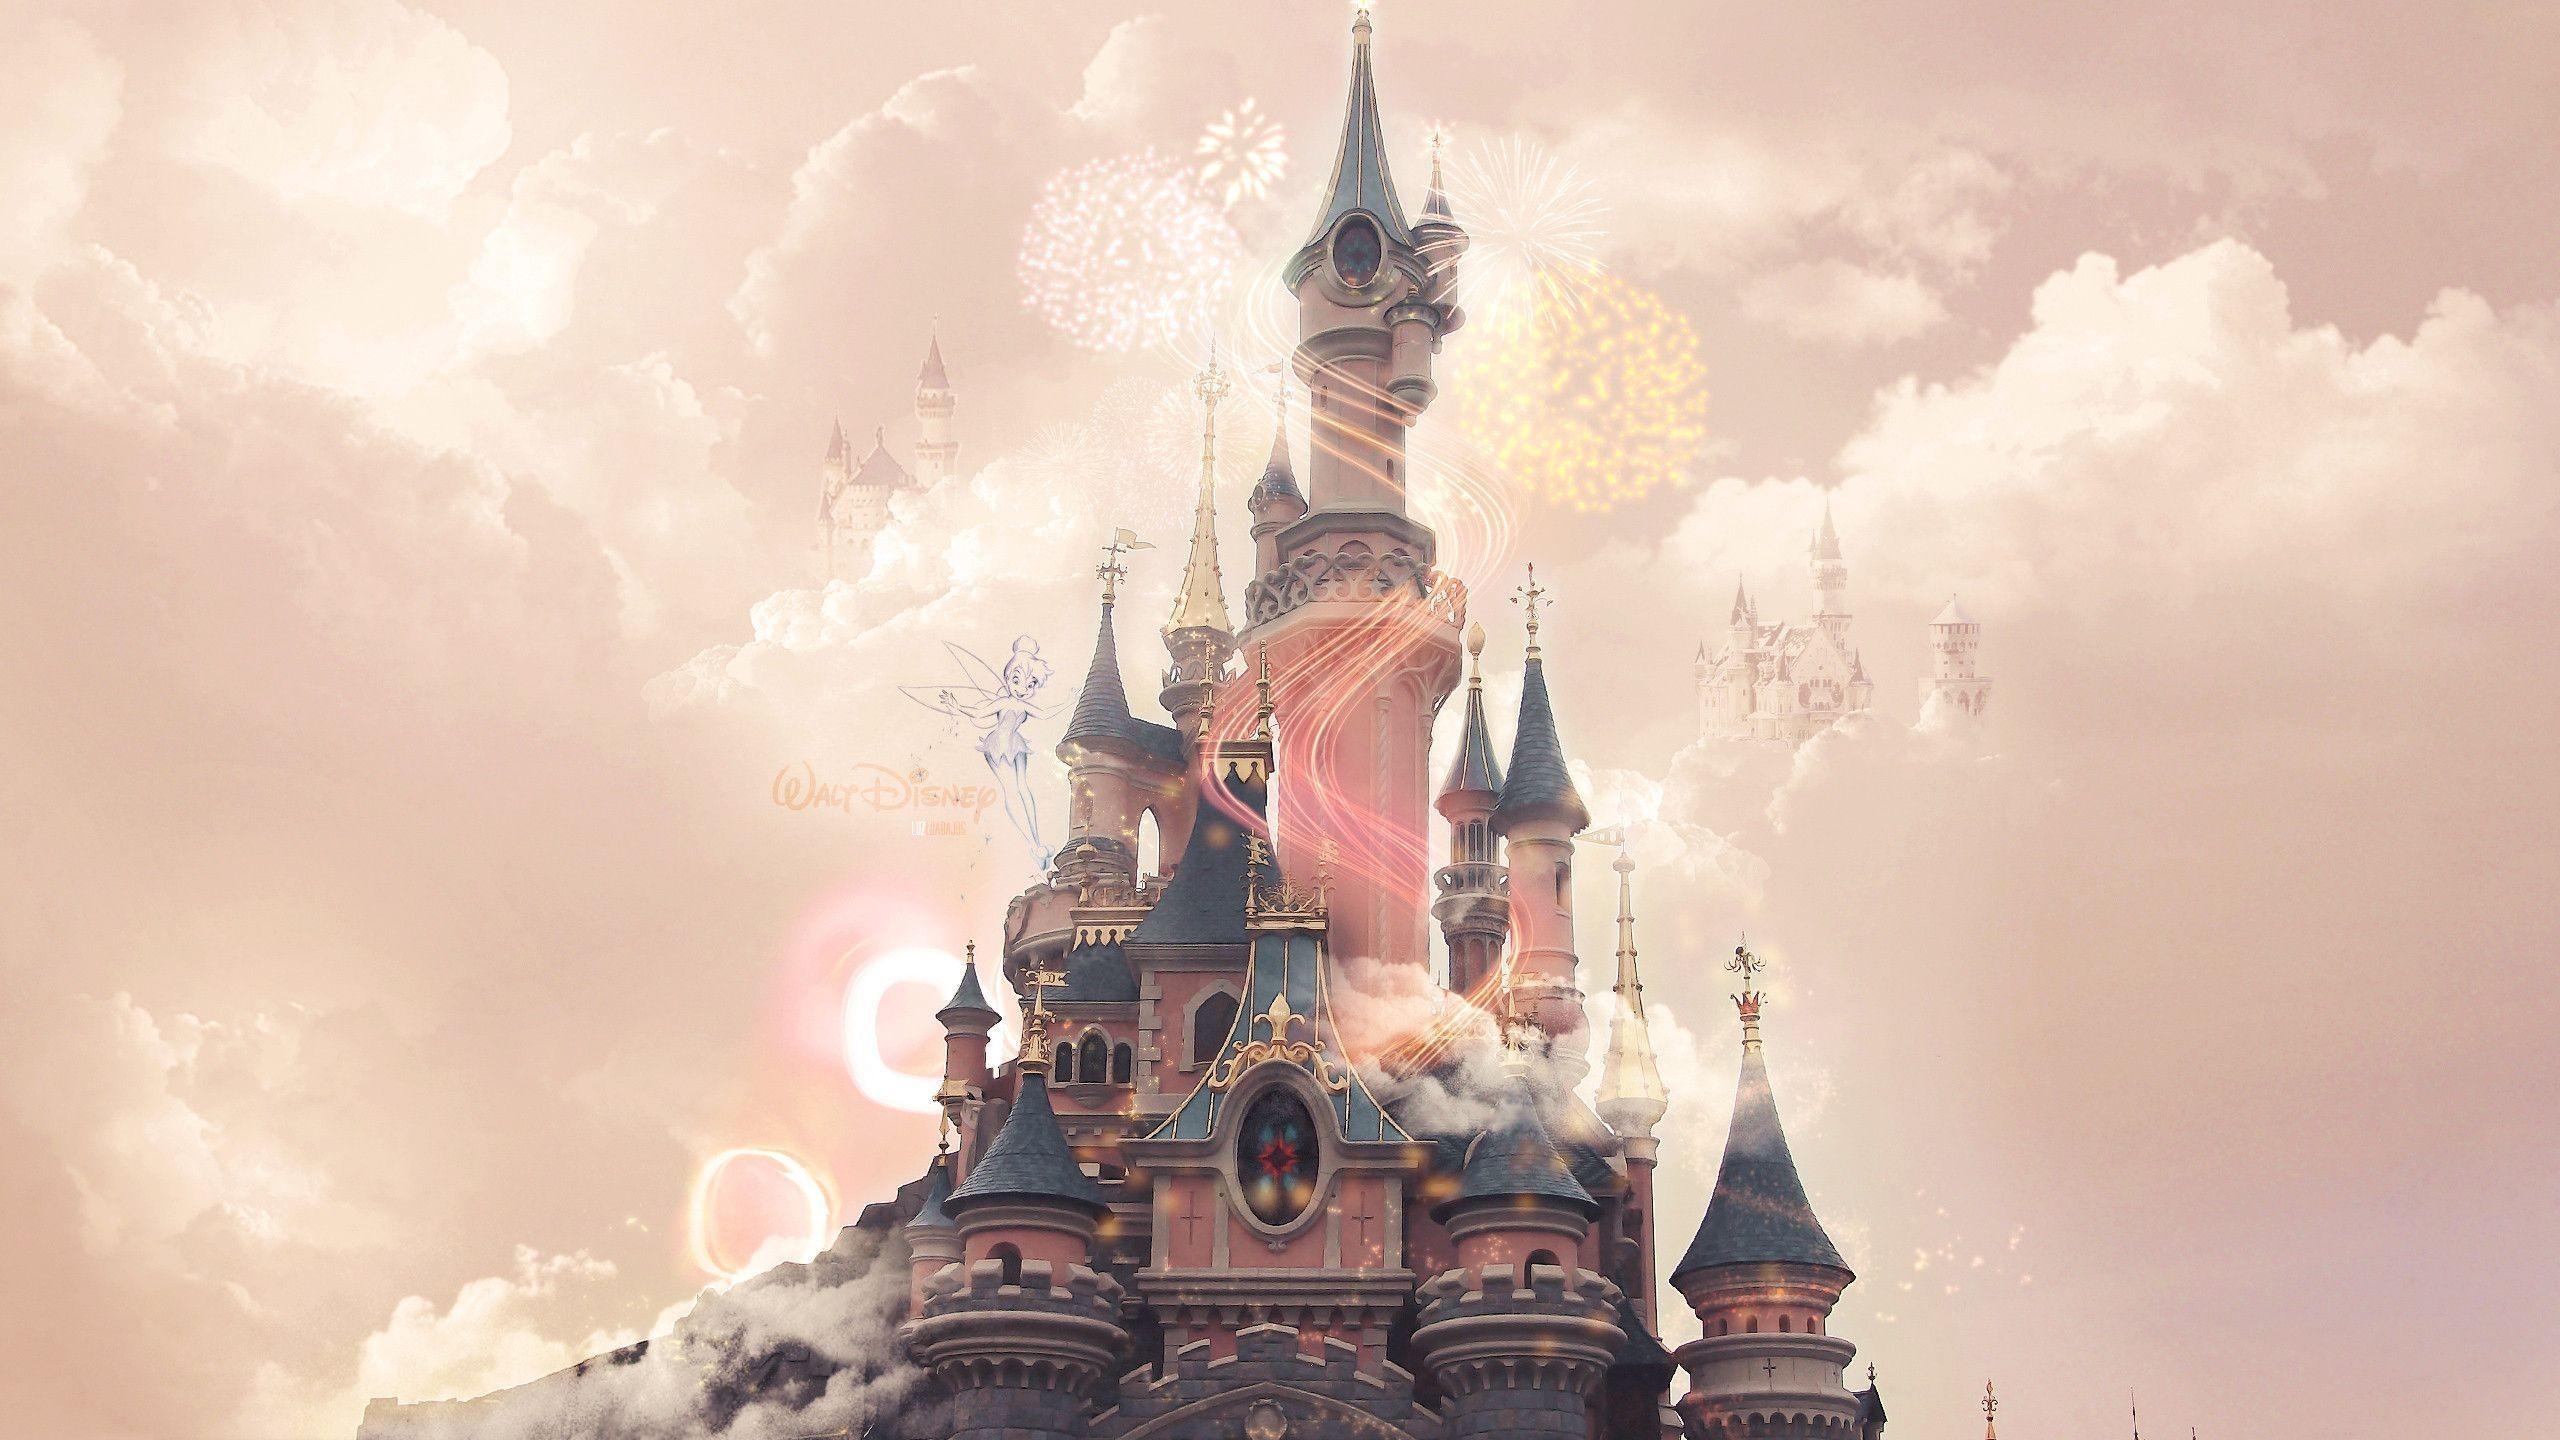 Disney castle background hd download.